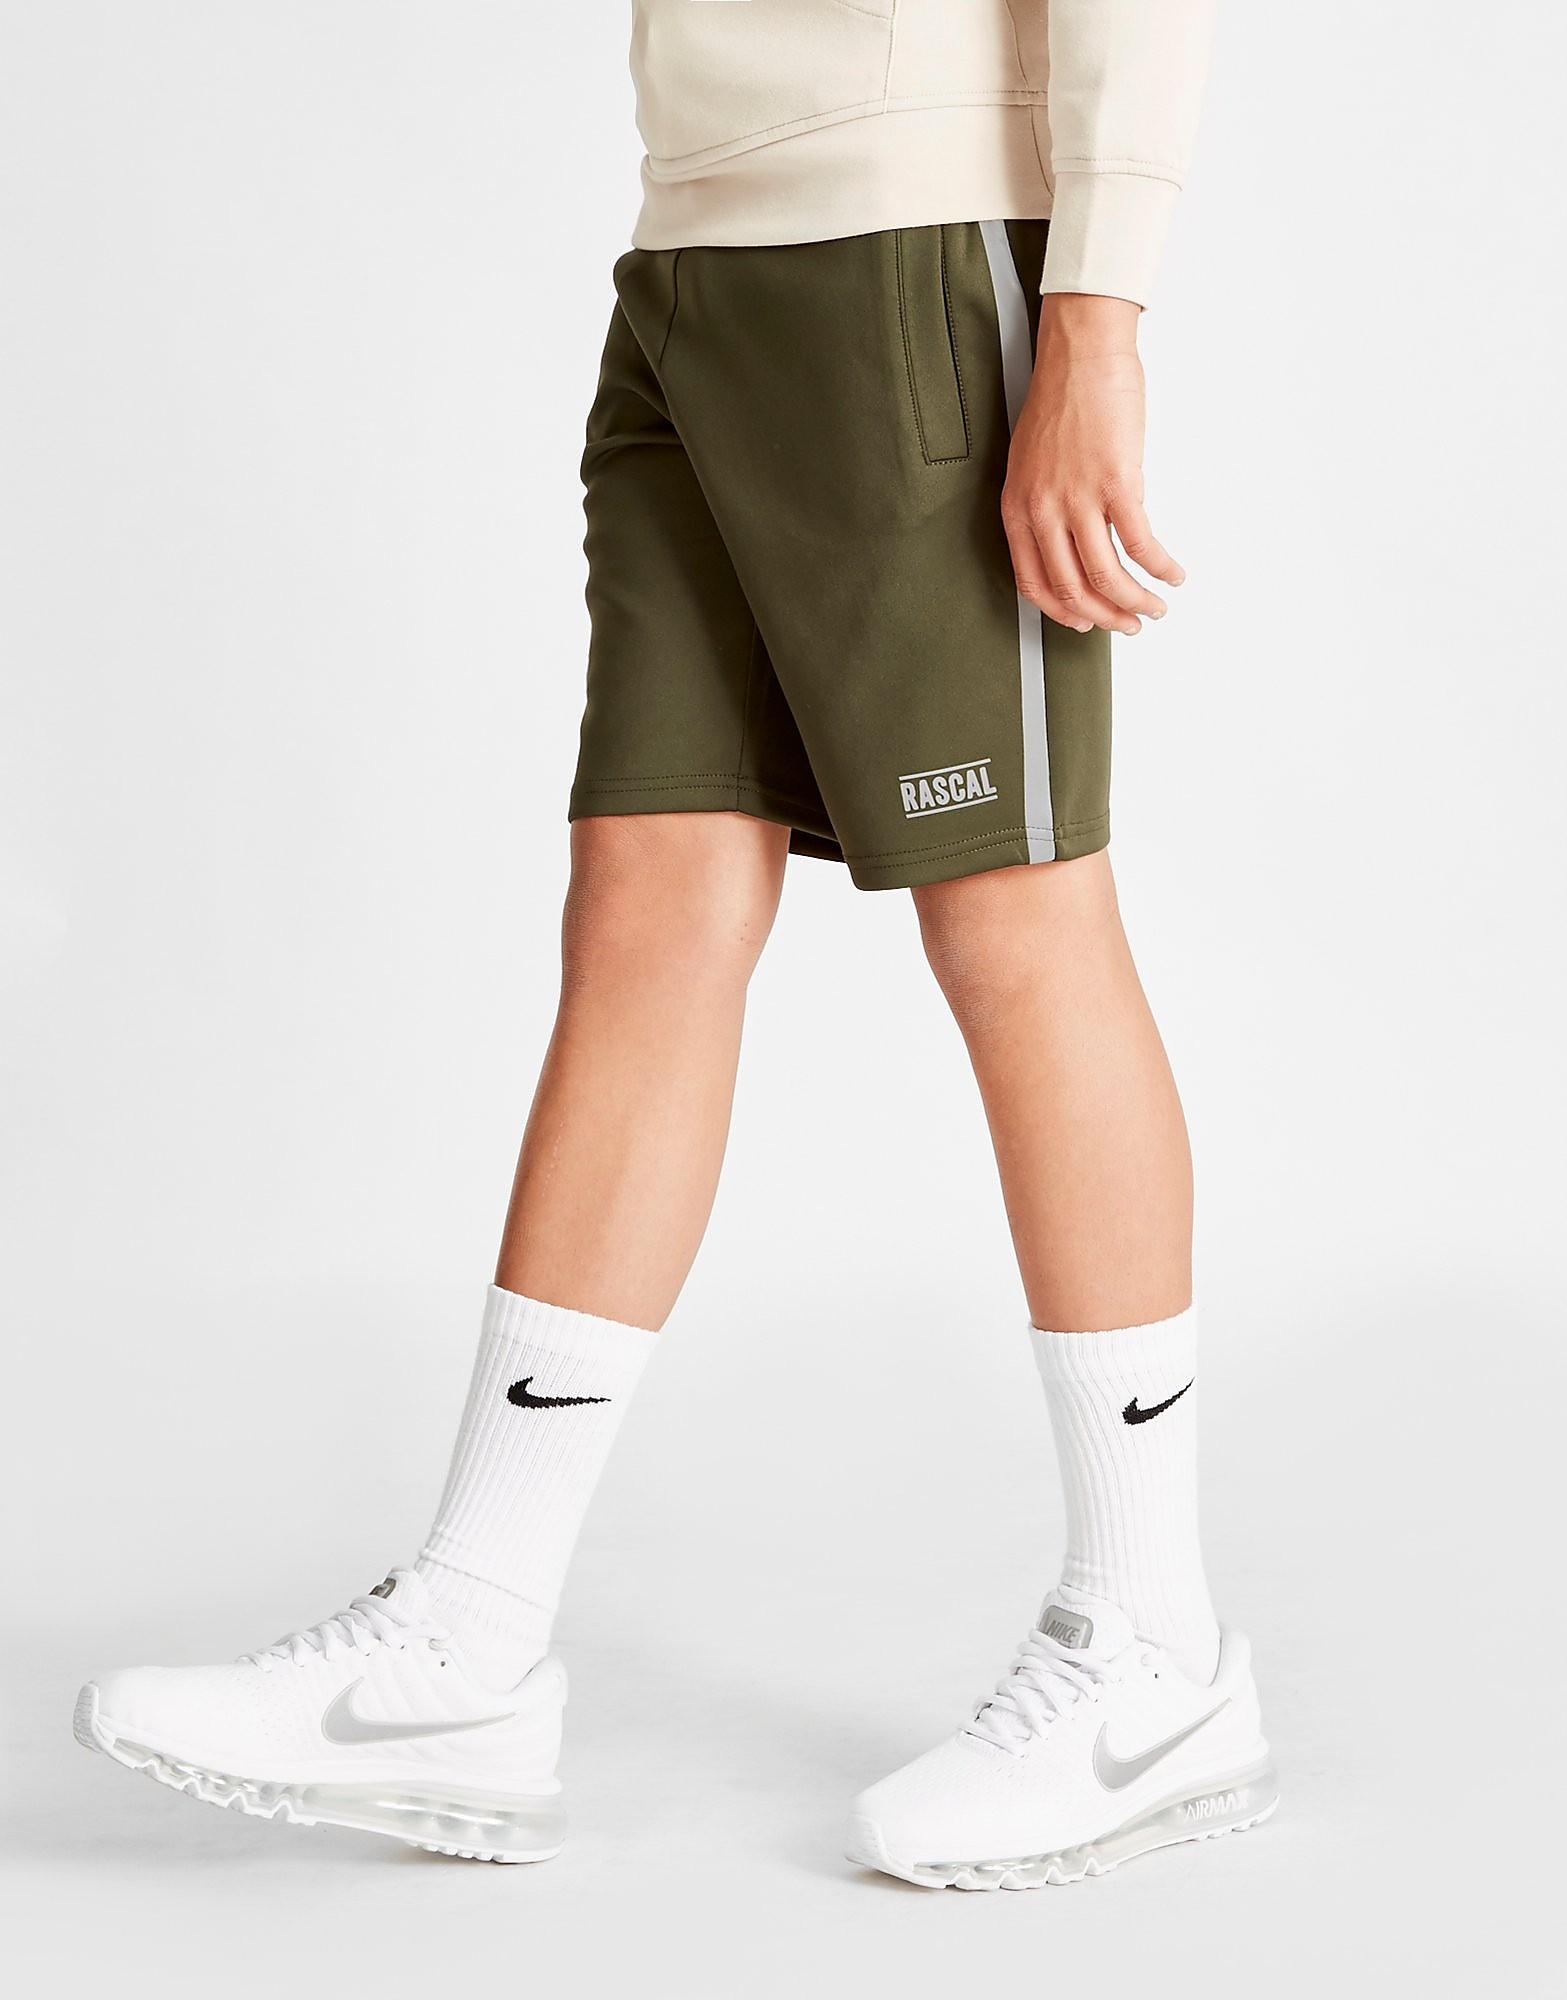 Rascal Mission Poly Shorts Junior - Khaki/Silver - Kind